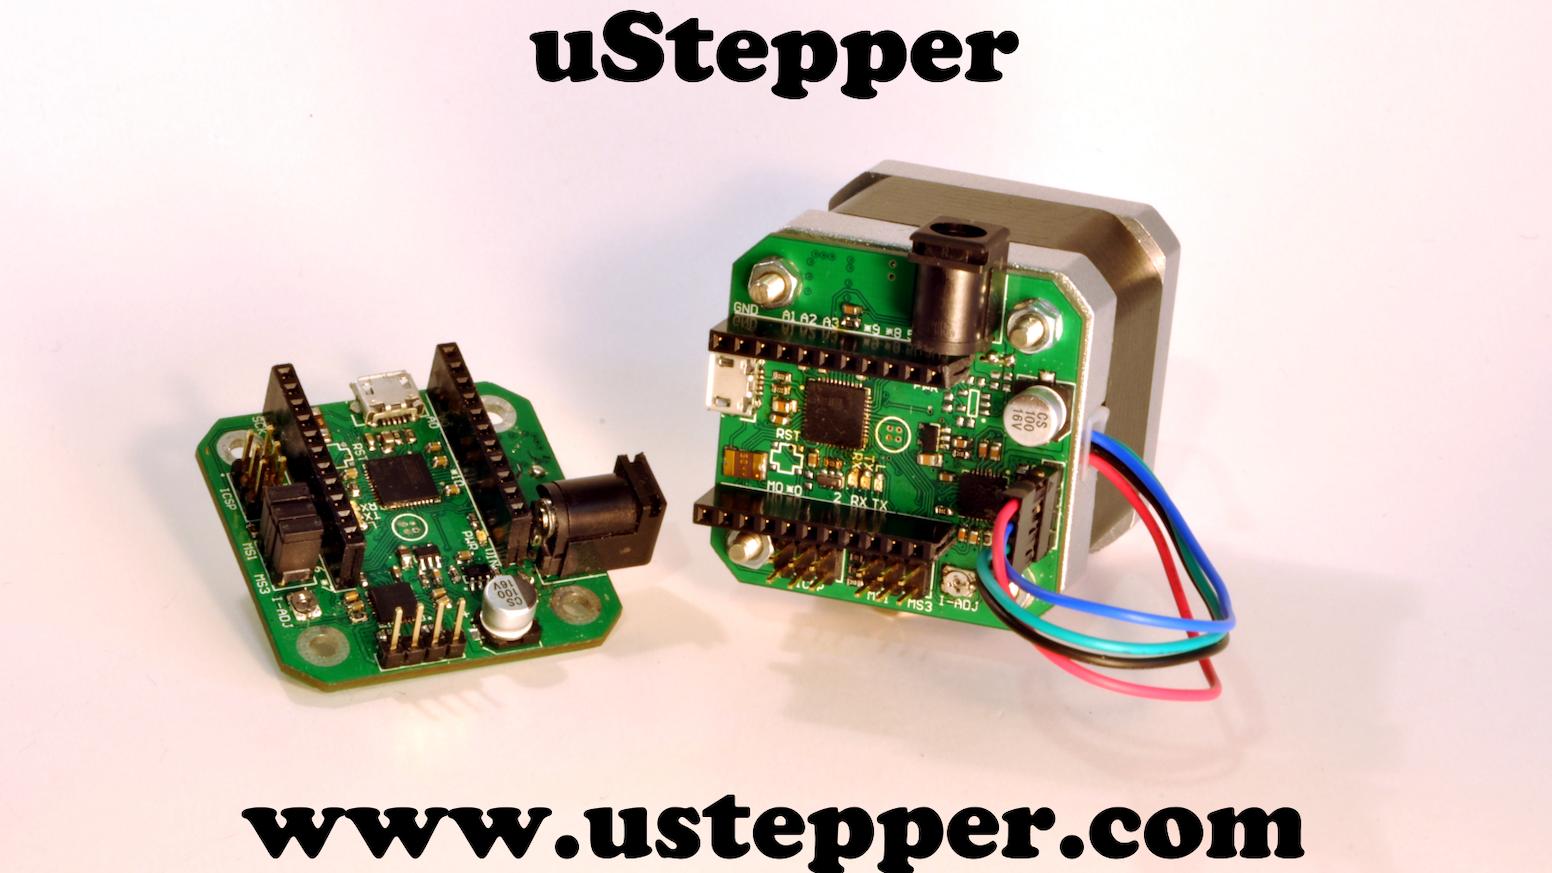 uStepper by ON Development IVS — Kickstarter